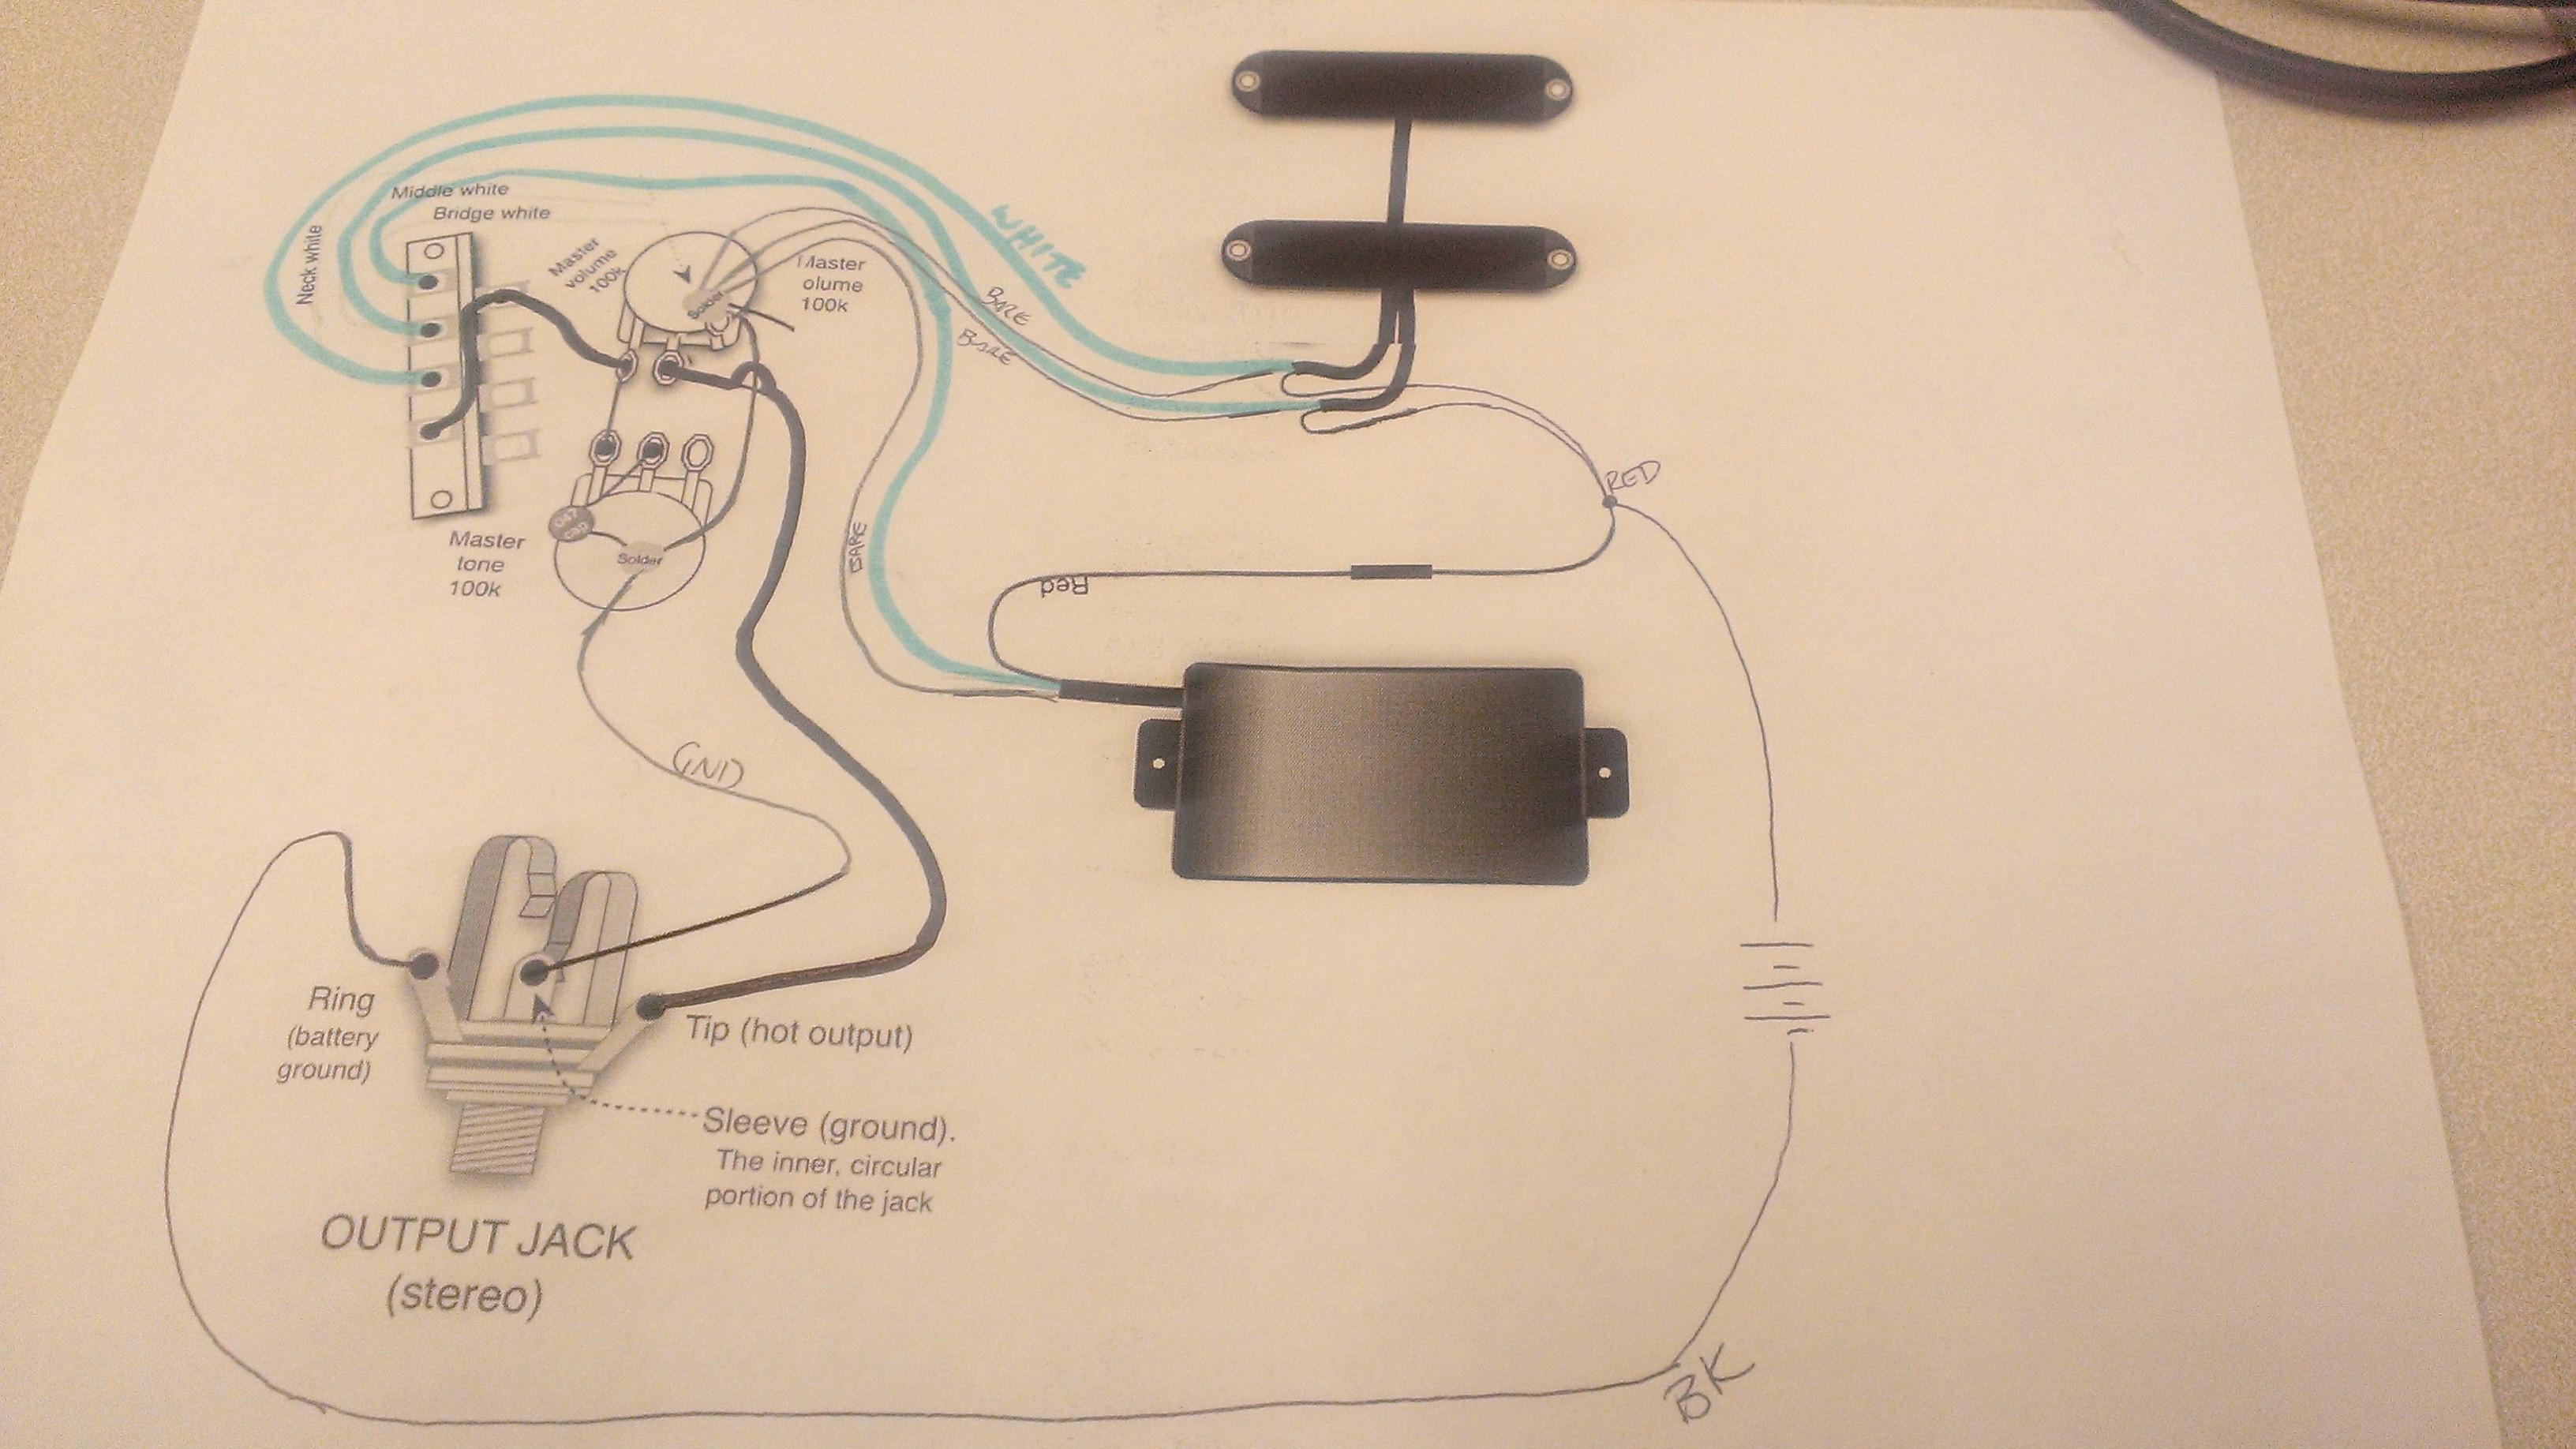 jackson soloist wiring diagram 30 wiring diagram images jackson humbucker wiring diagram jackson pickup wiring diagram [ 3264 x 1836 Pixel ]